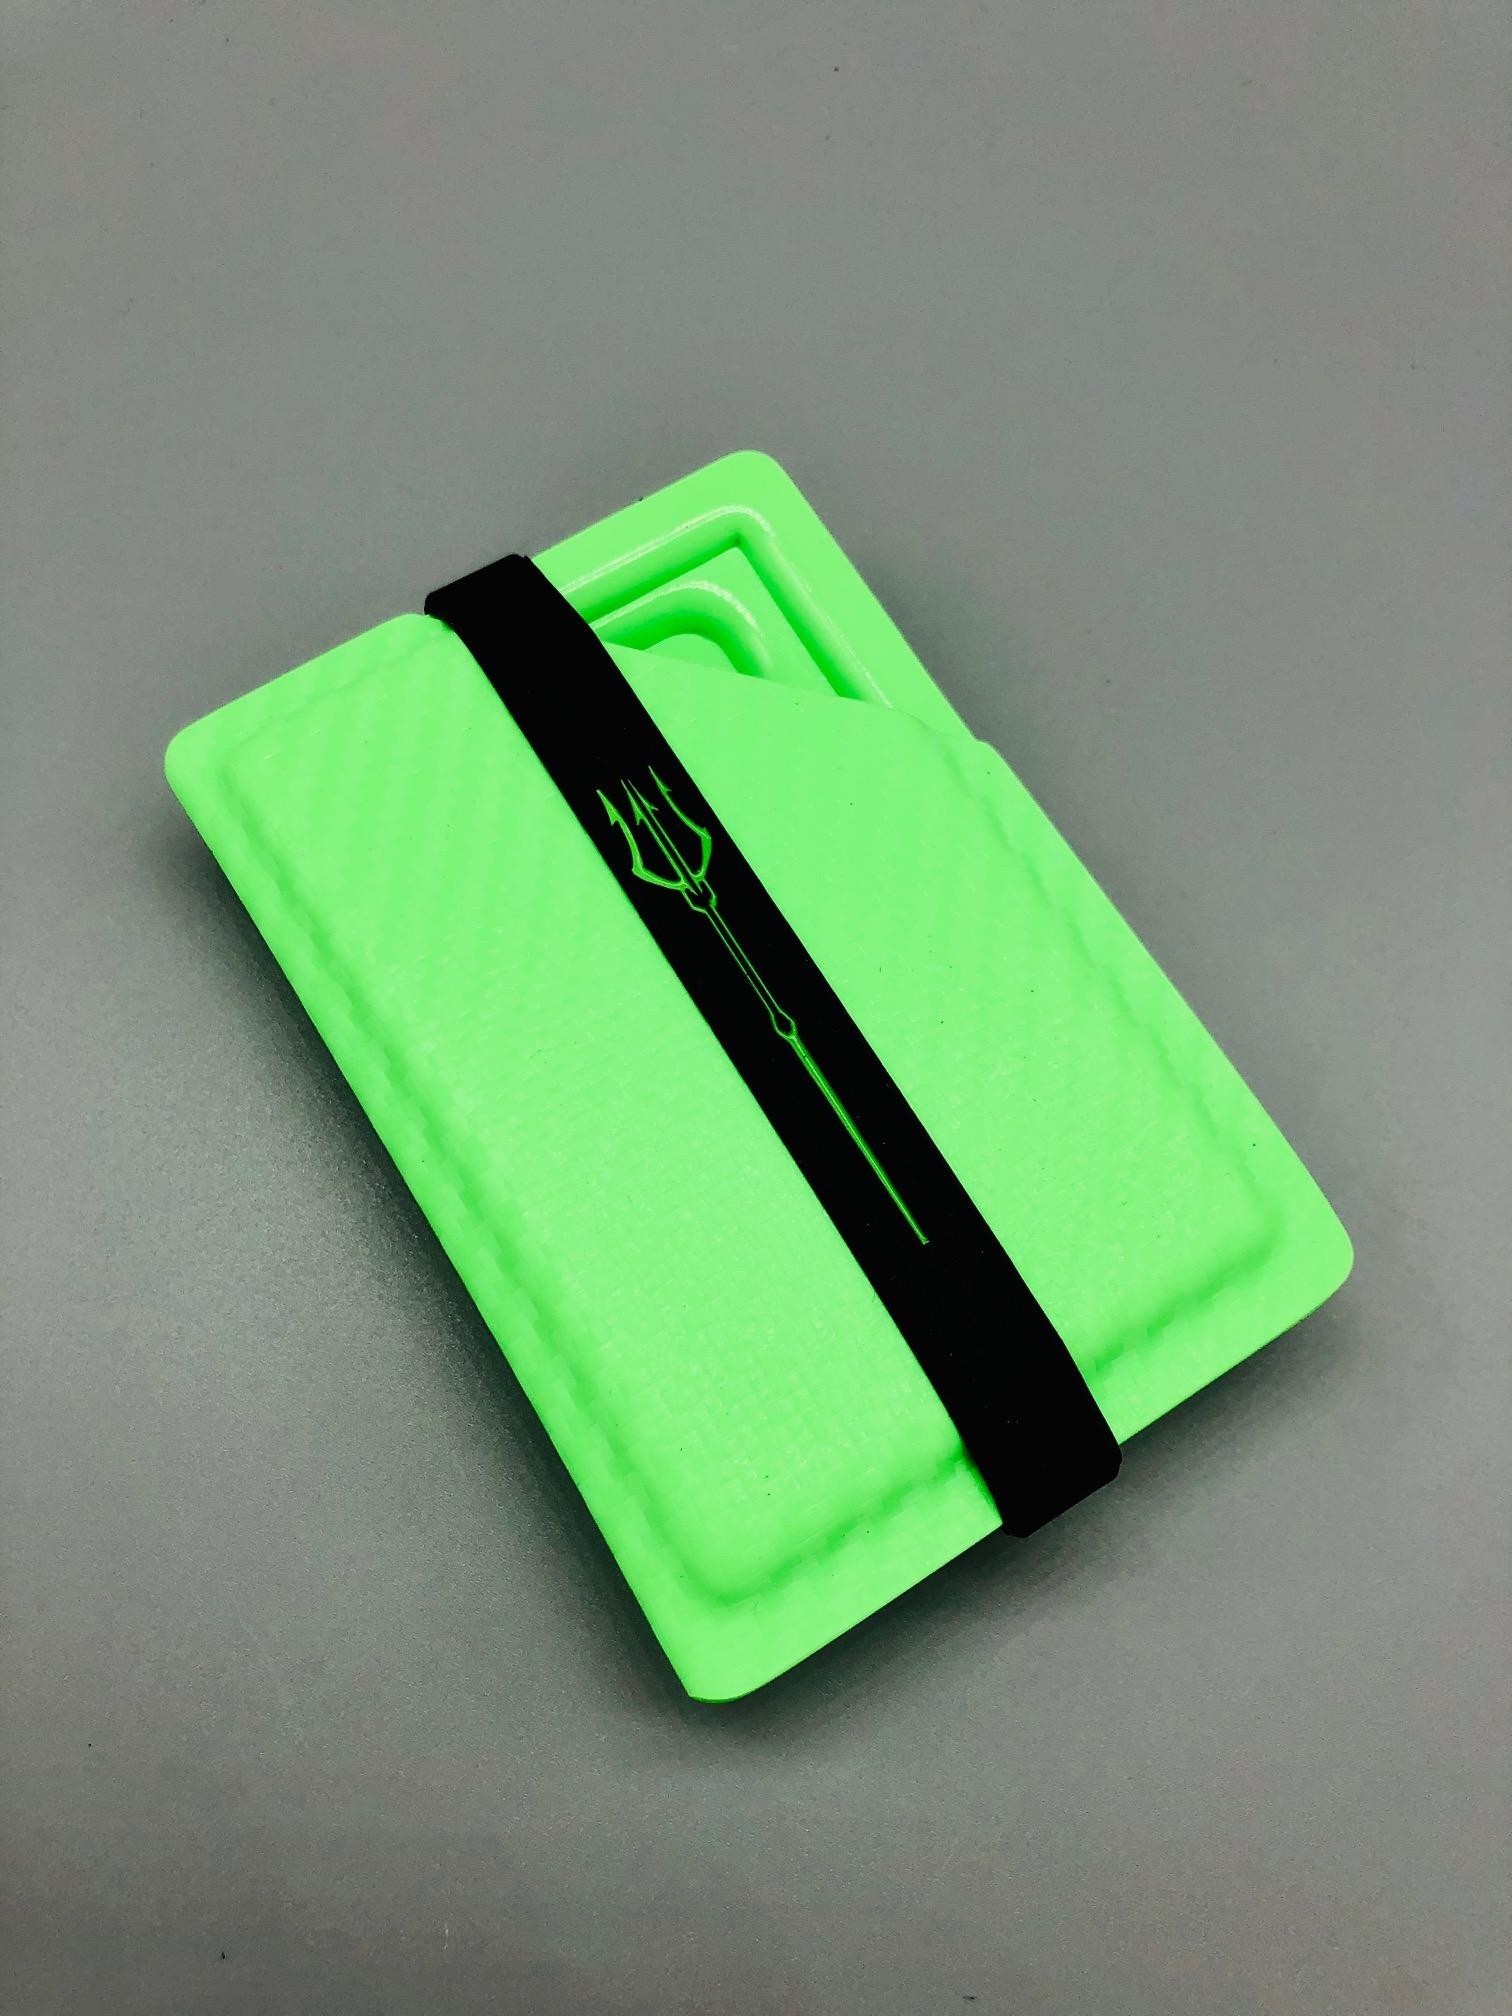 OD Green Carbon Fiber Kydex Money Clip ~By WP~